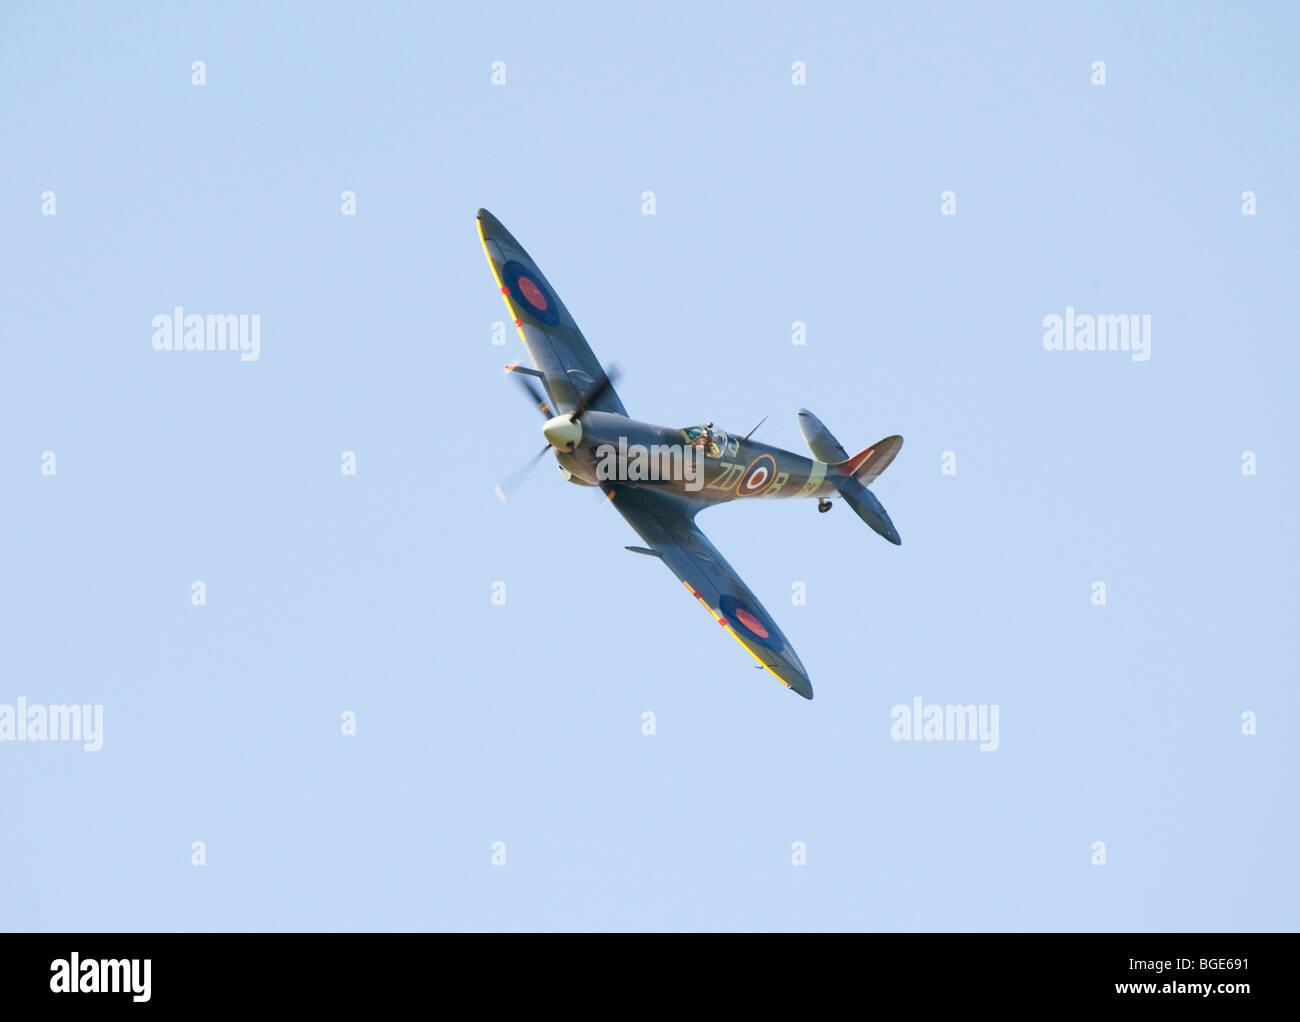 Spitfire aircraft at air show 2009 - Stock Image